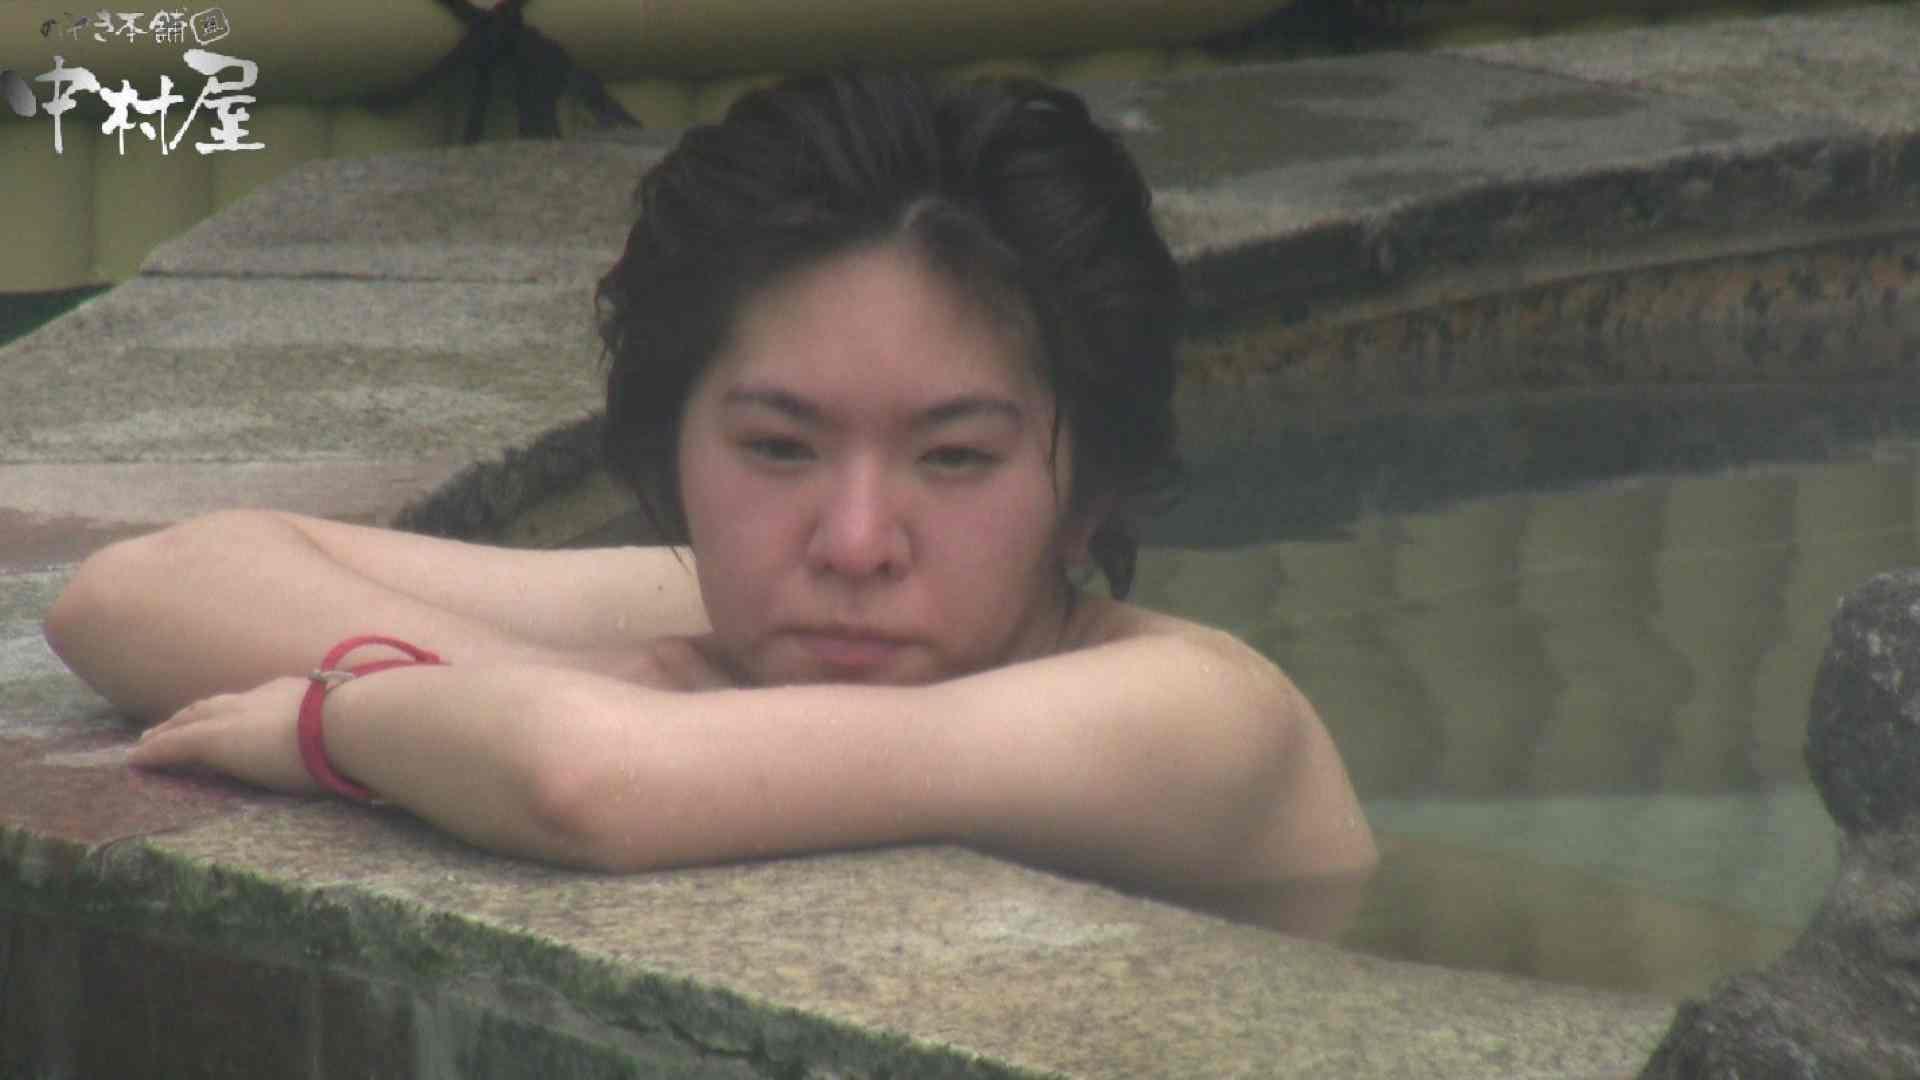 Aquaな露天風呂Vol.907 OL女体  95連発 87